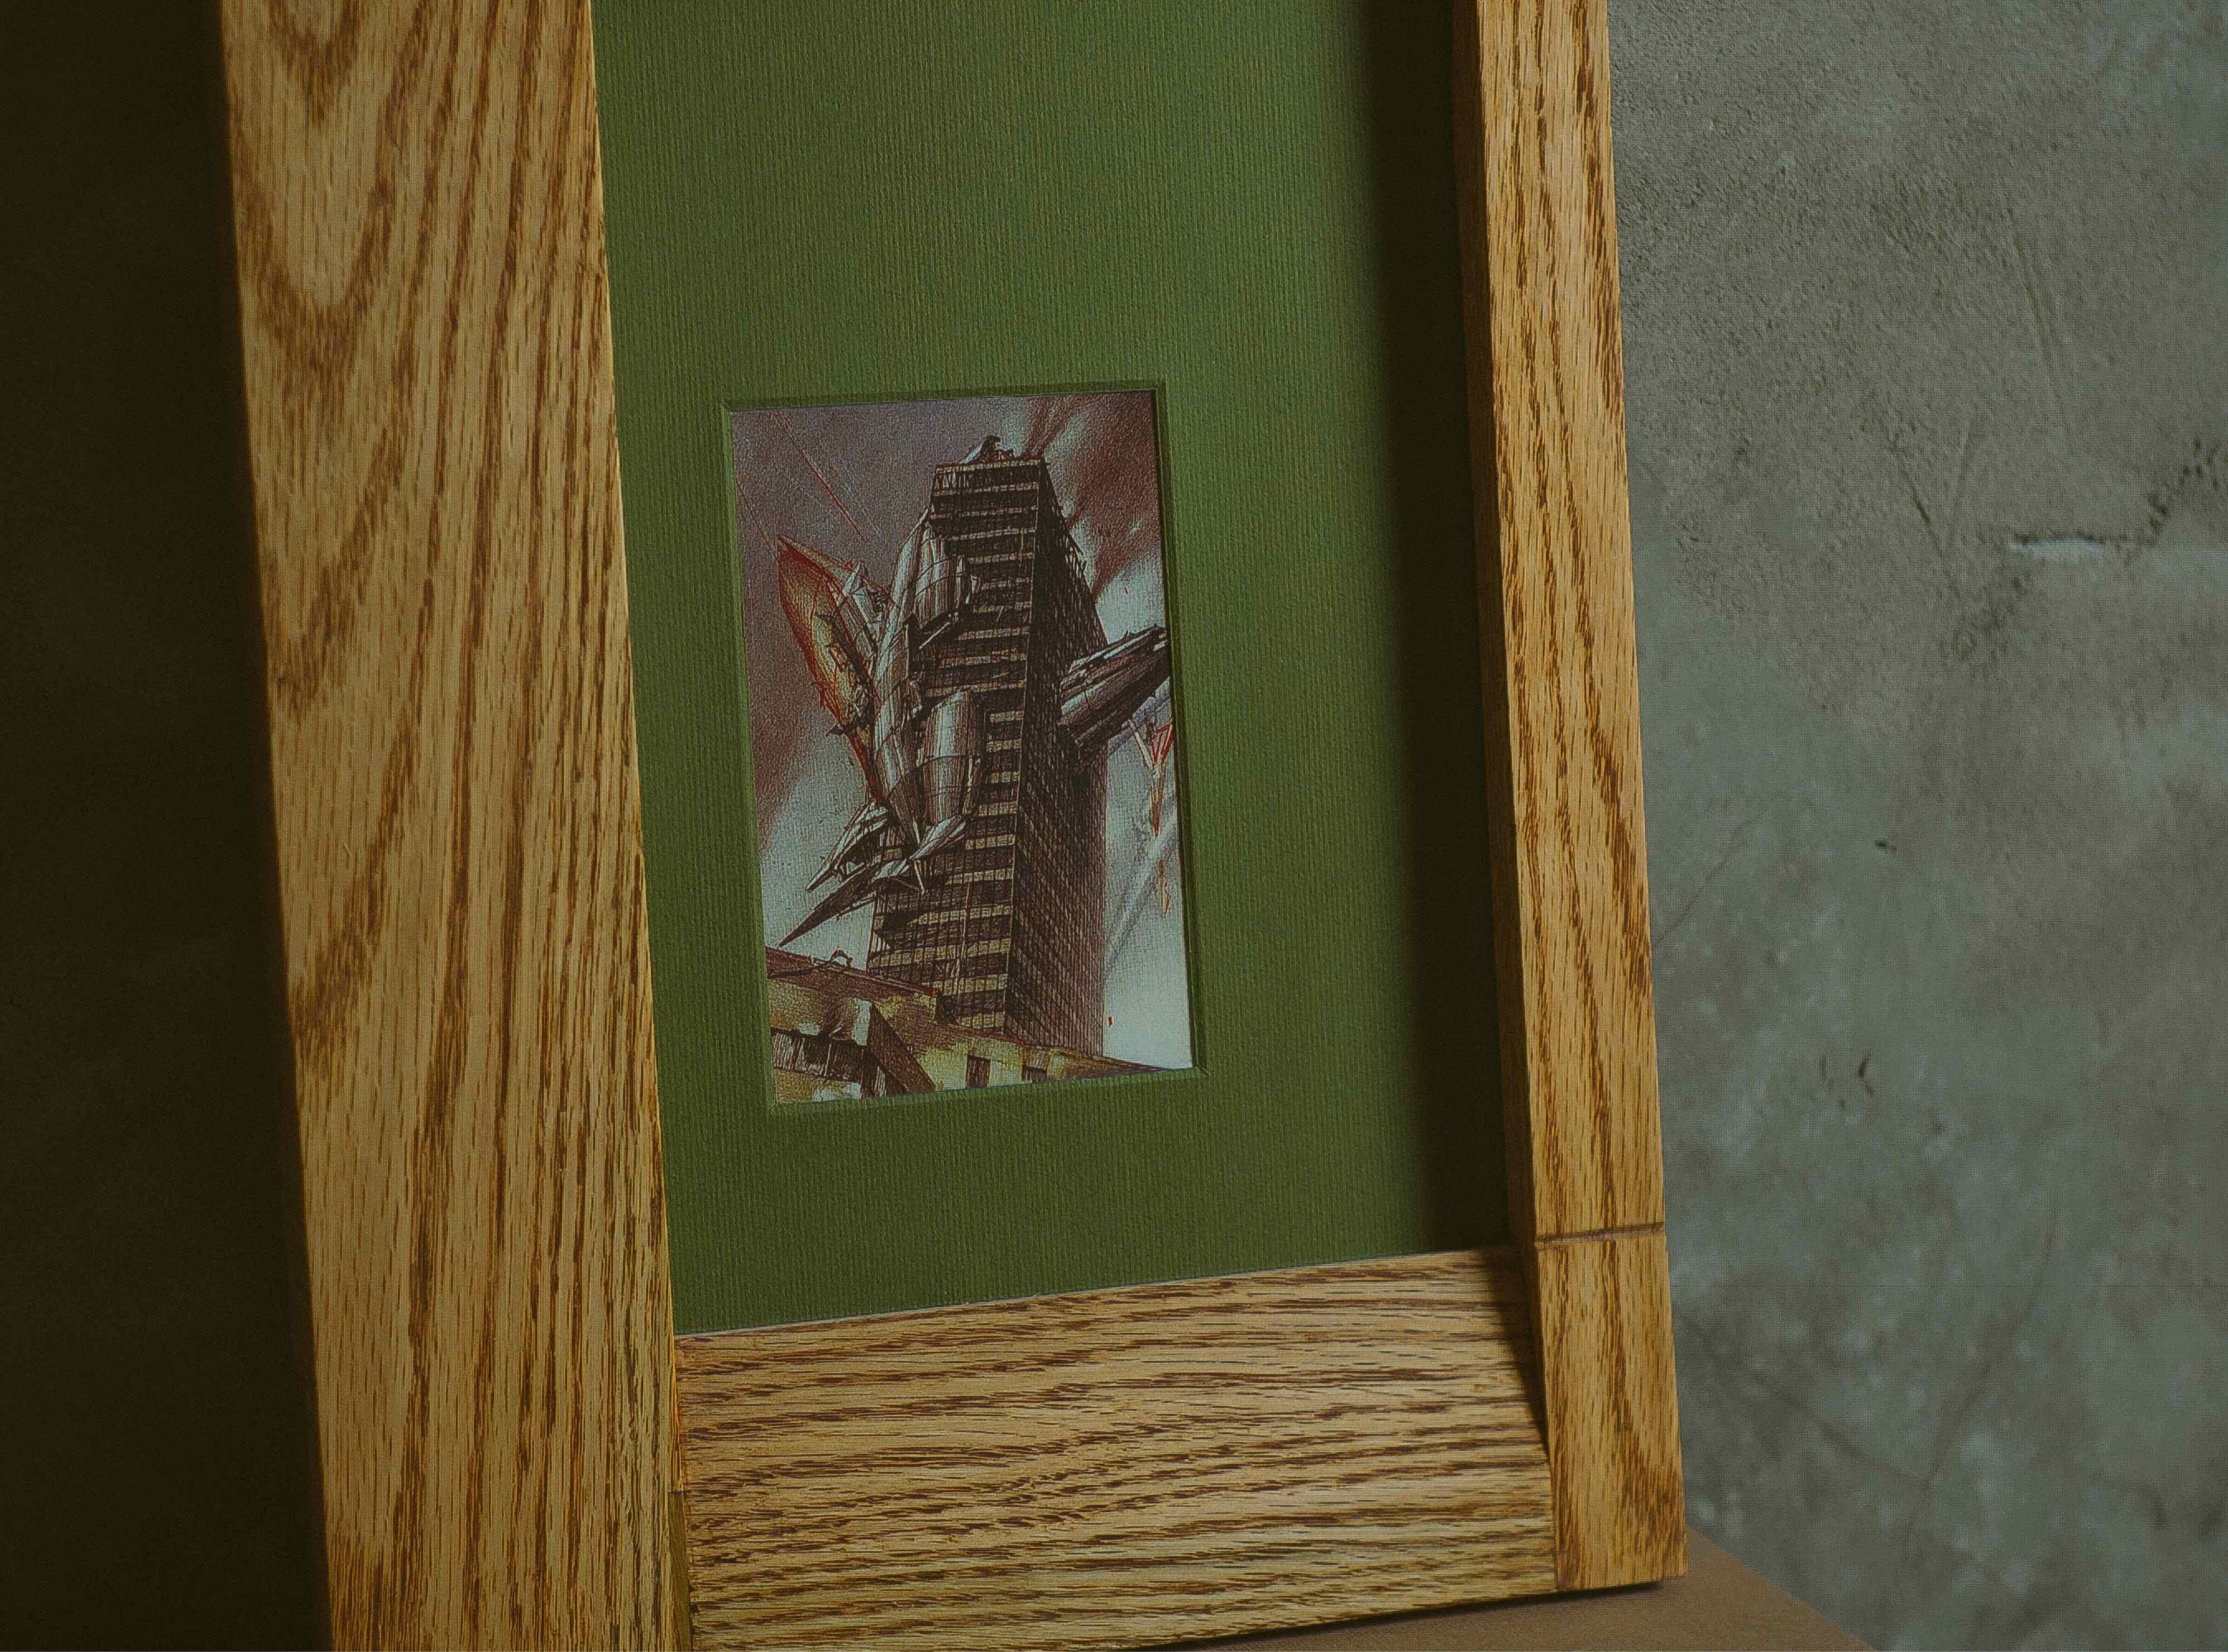 Рамка для фото CBS 1114 из массива клёна, дуба и американского ореха от Fly Massive Millworks